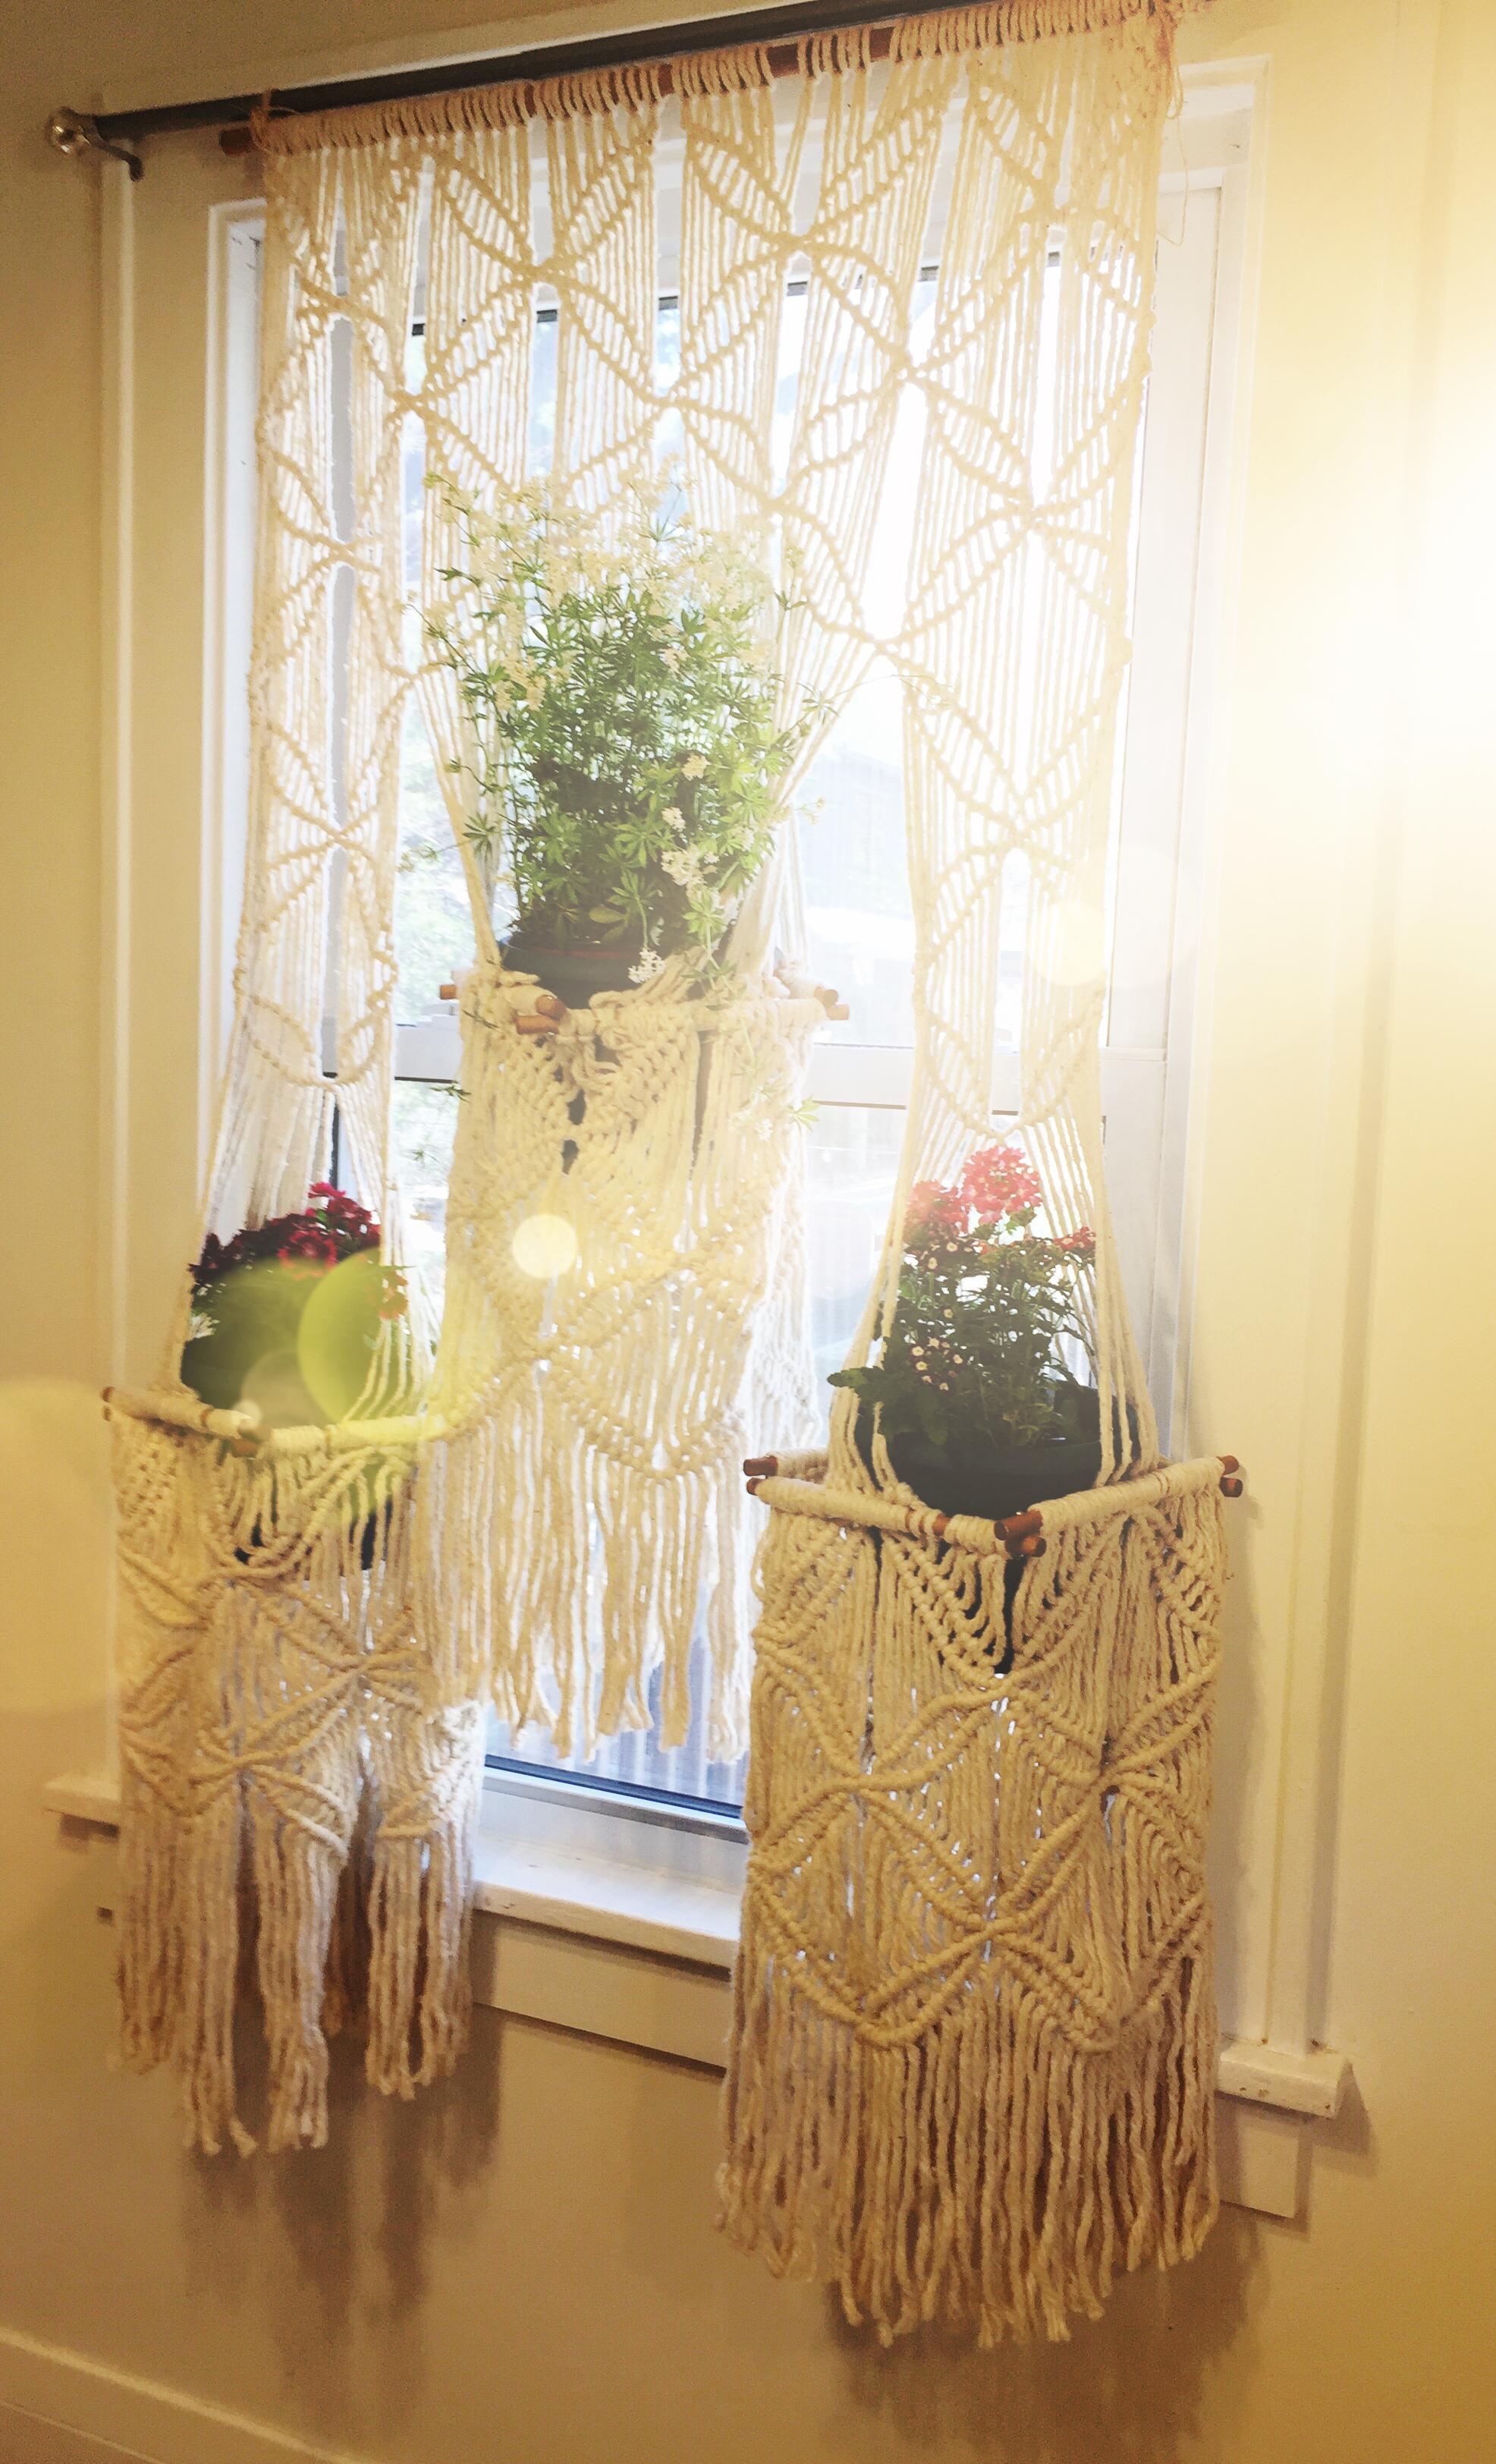 Knotty by Nature Vintage Macramé Plant Hanger Curtain